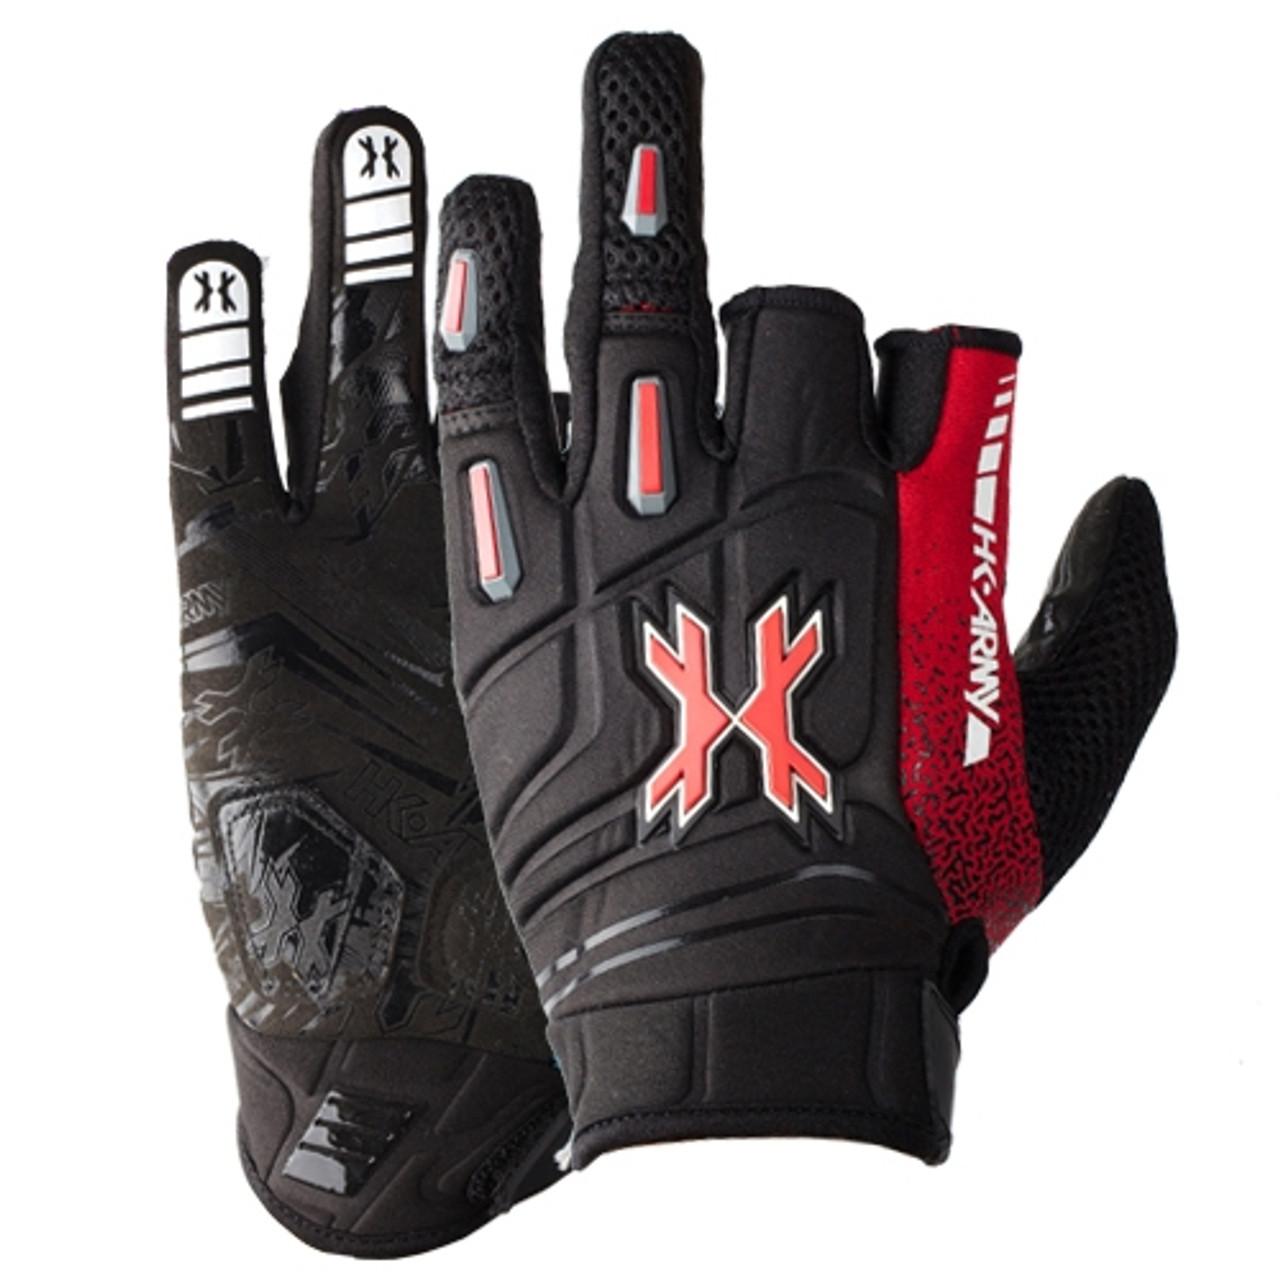 HK - Pro Glove - Lava